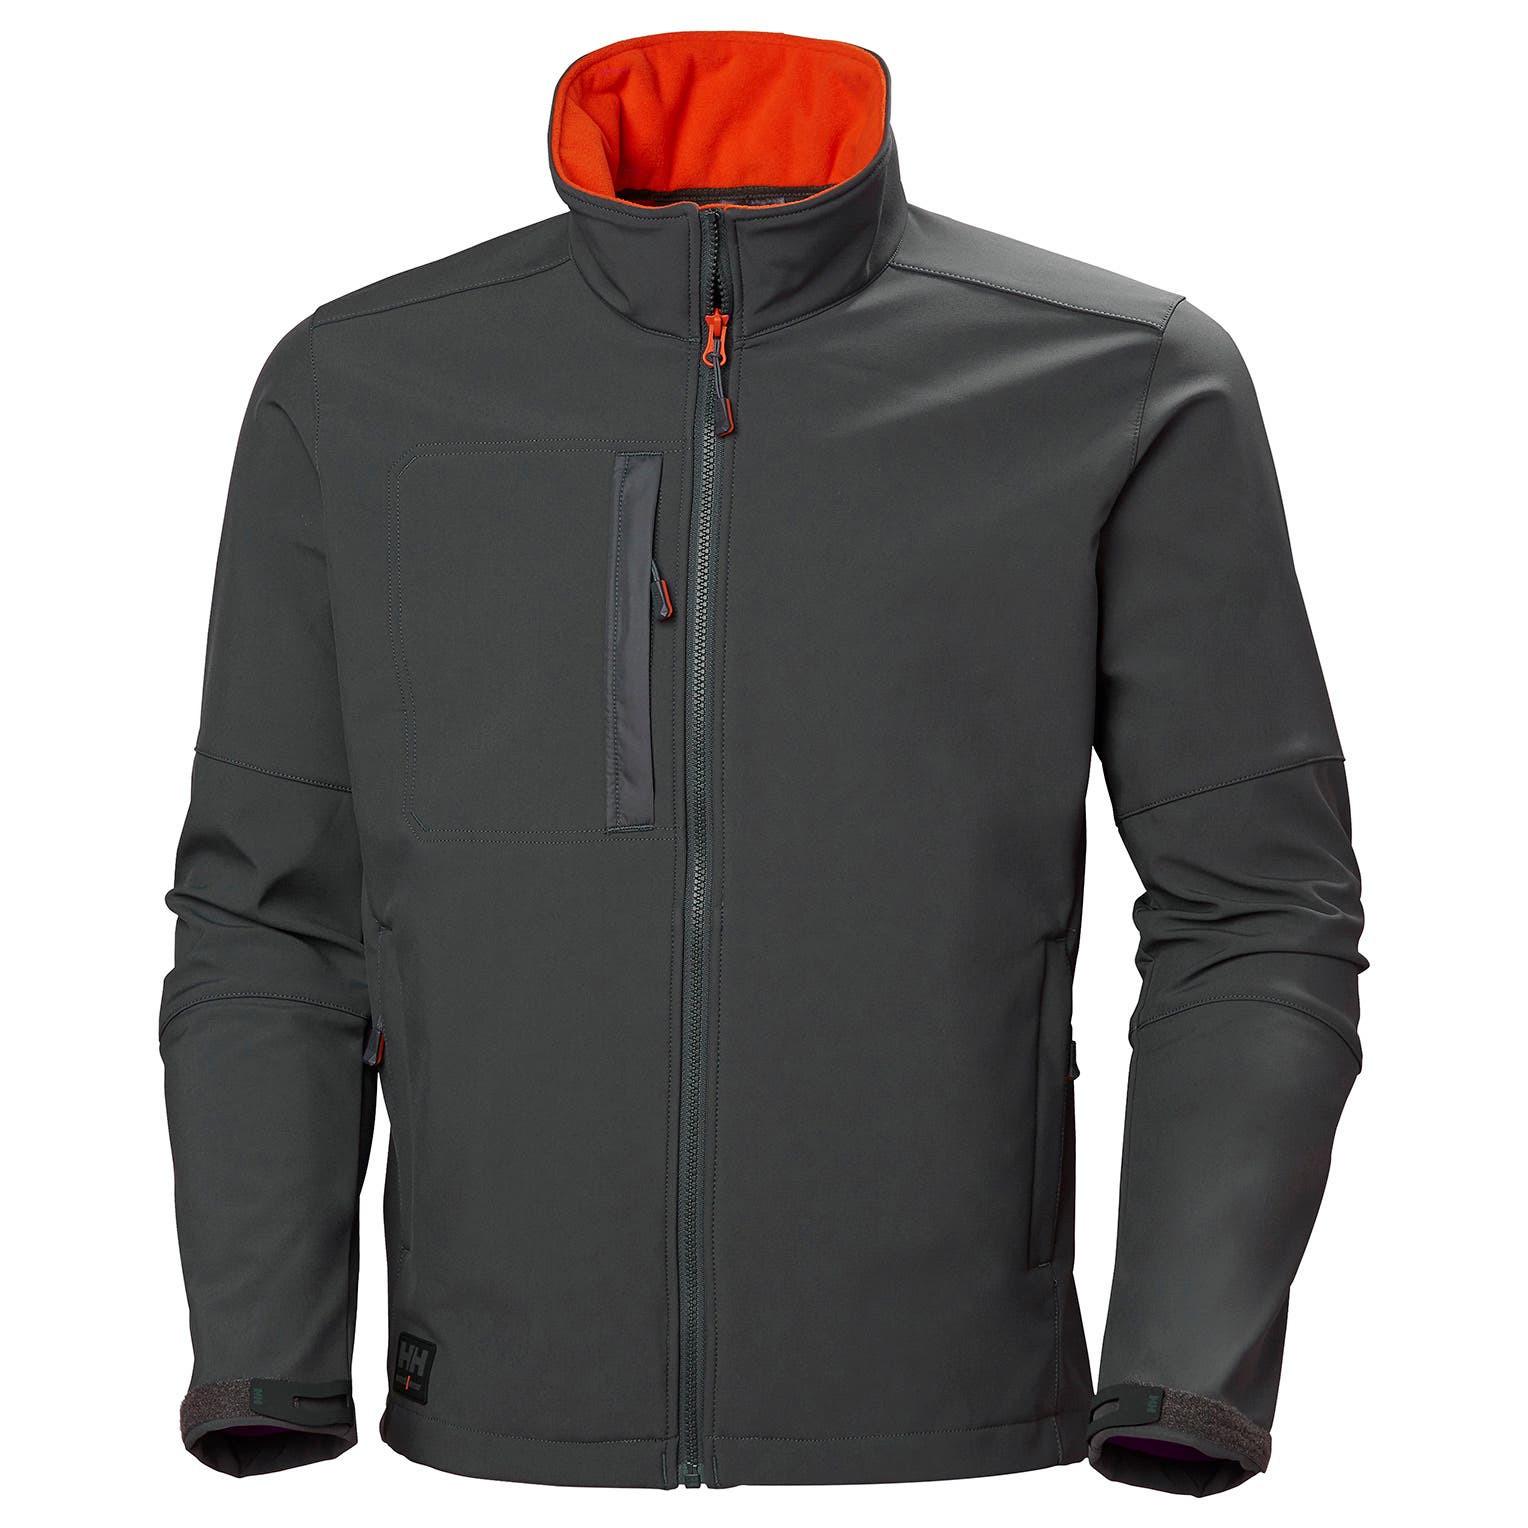 Куртка Helly Hansen Kensington Softshell Jacket - 74231 (Dark Grey, L)